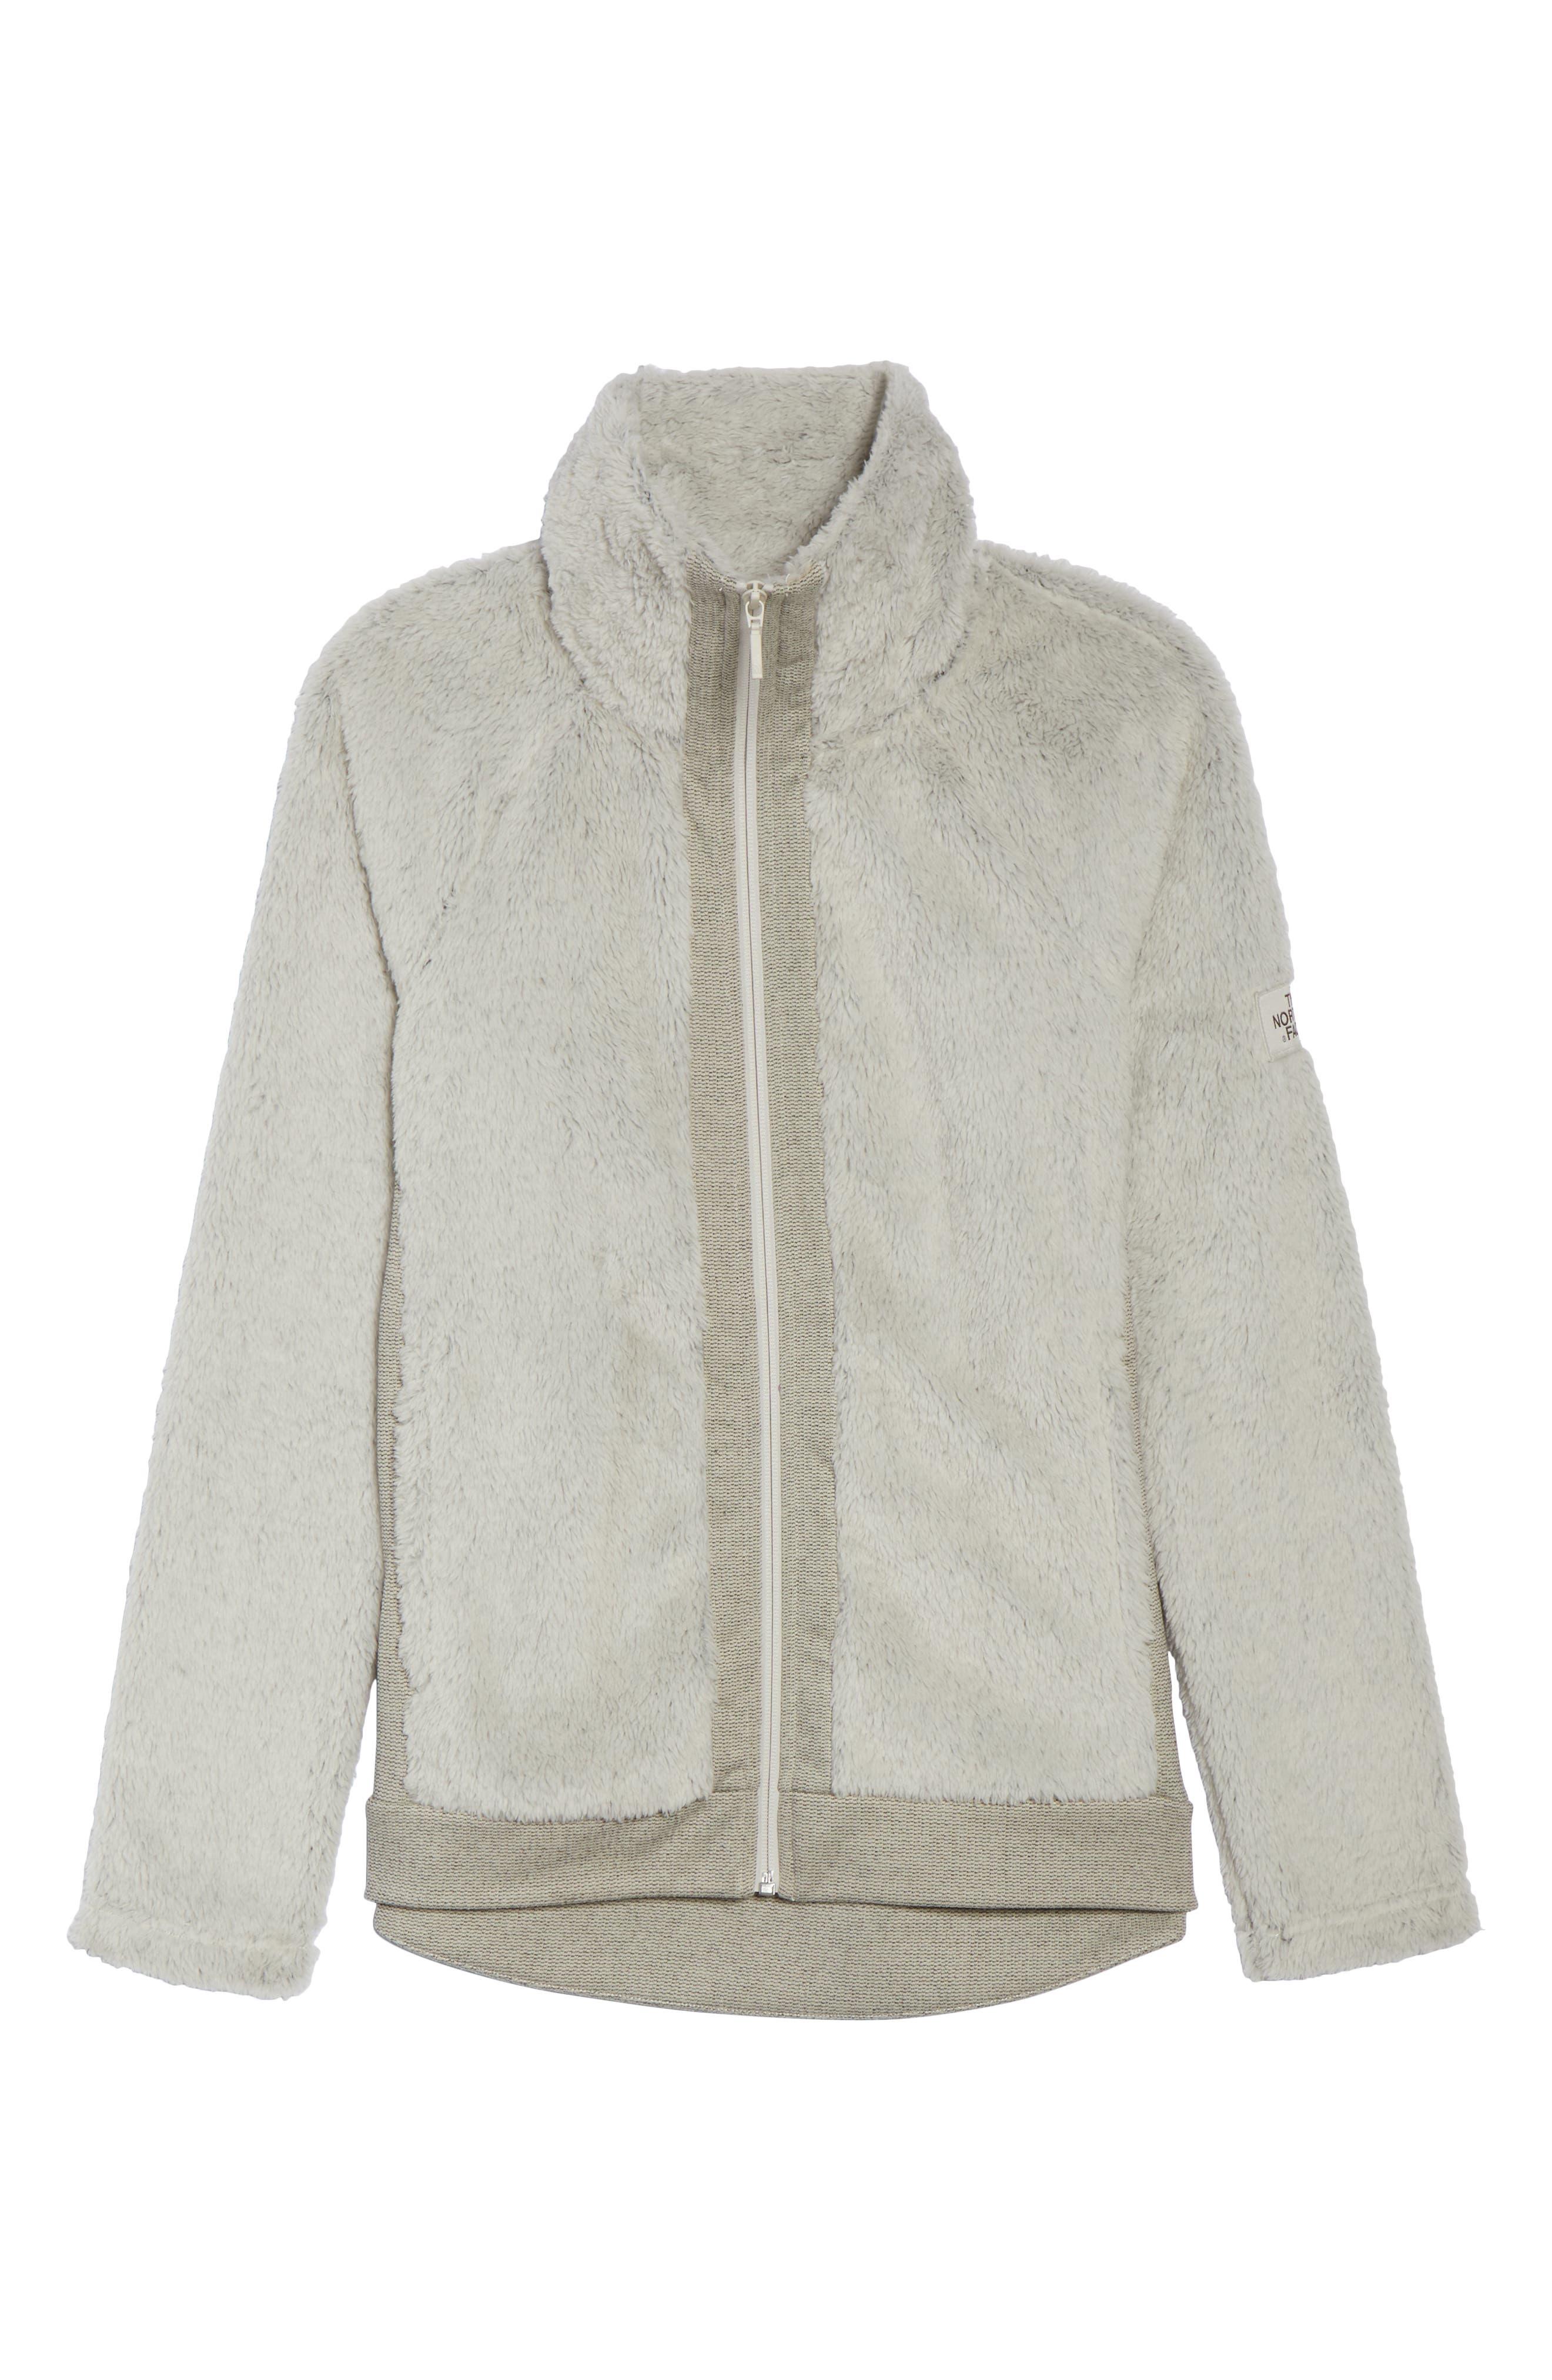 THE NORTH FACE, Furry Fleece Jacket, Alternate thumbnail 6, color, VINTAGE WHITE